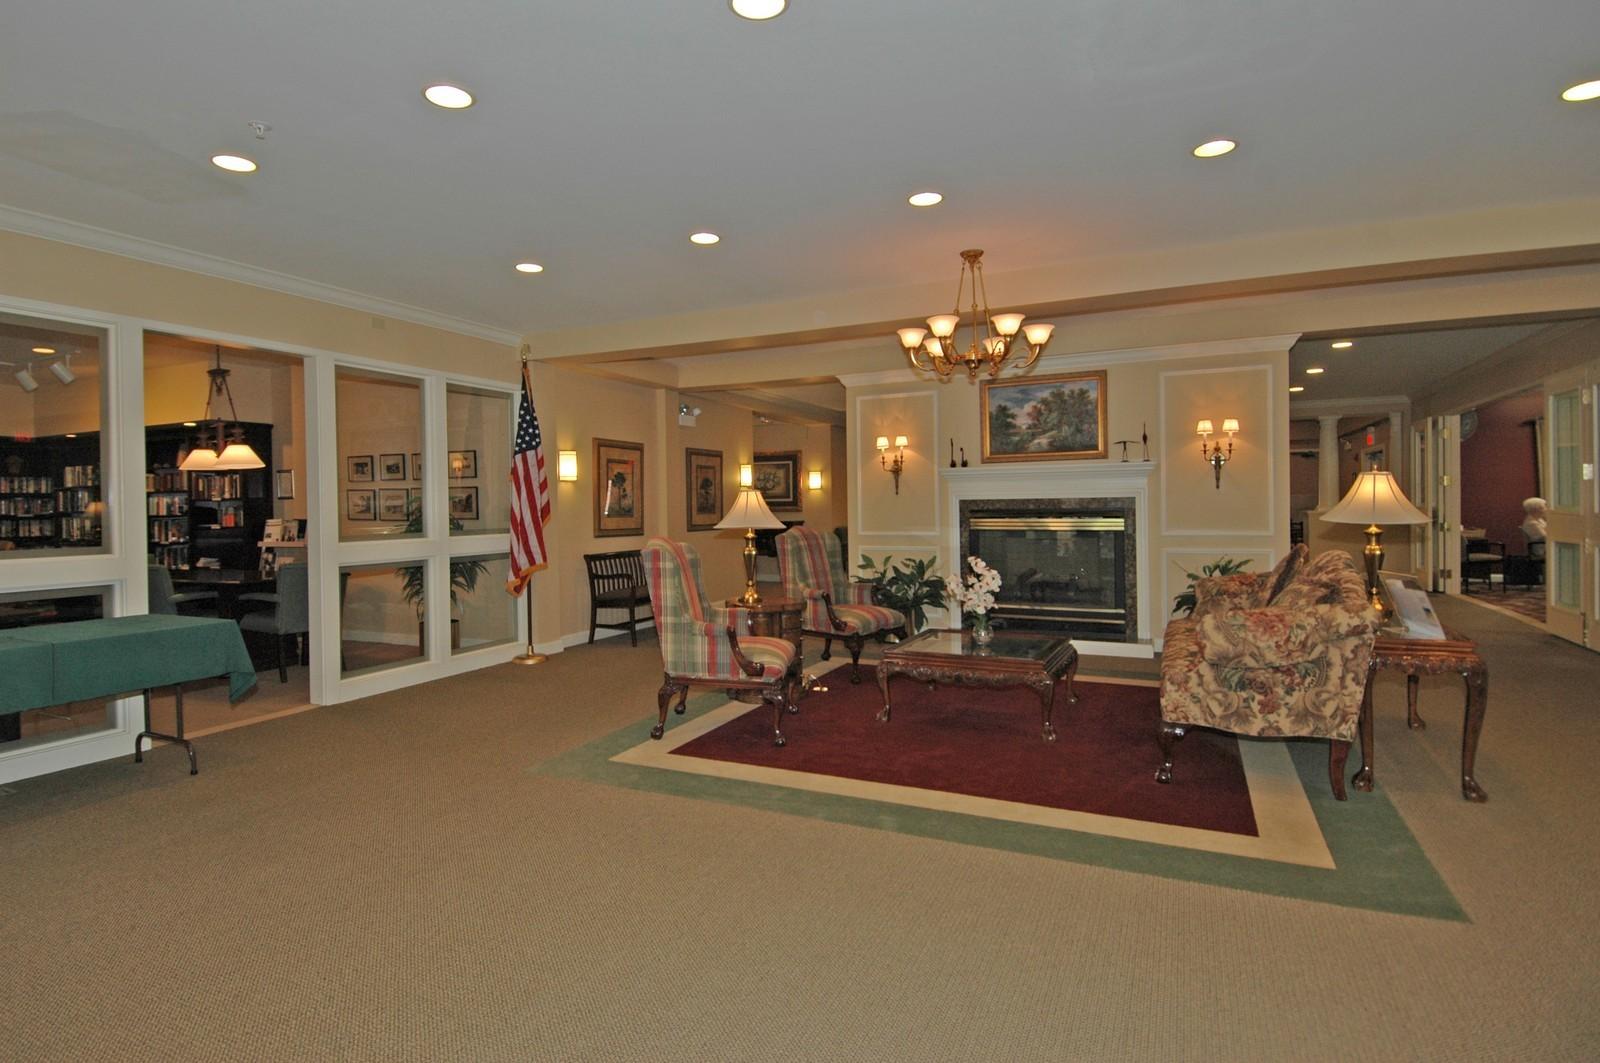 Real Estate Photography - 605 Barrington Ave, Unit 216, East Dundee, IL, 60118 - Lobby